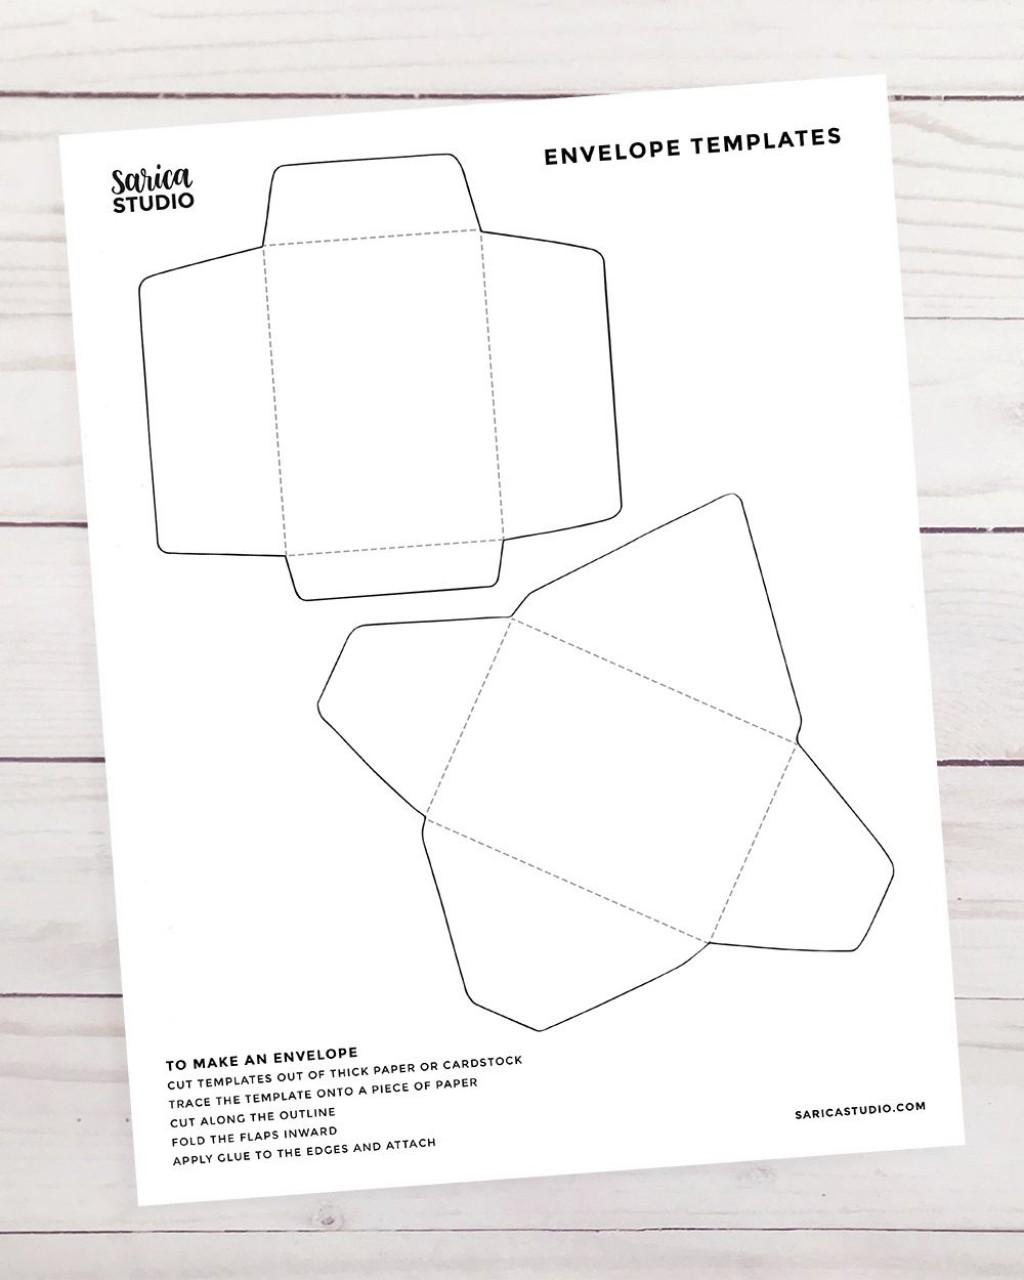 012 Frightening Gift Card Envelope Template Idea  Templates Voucher Diy Free PrintableLarge